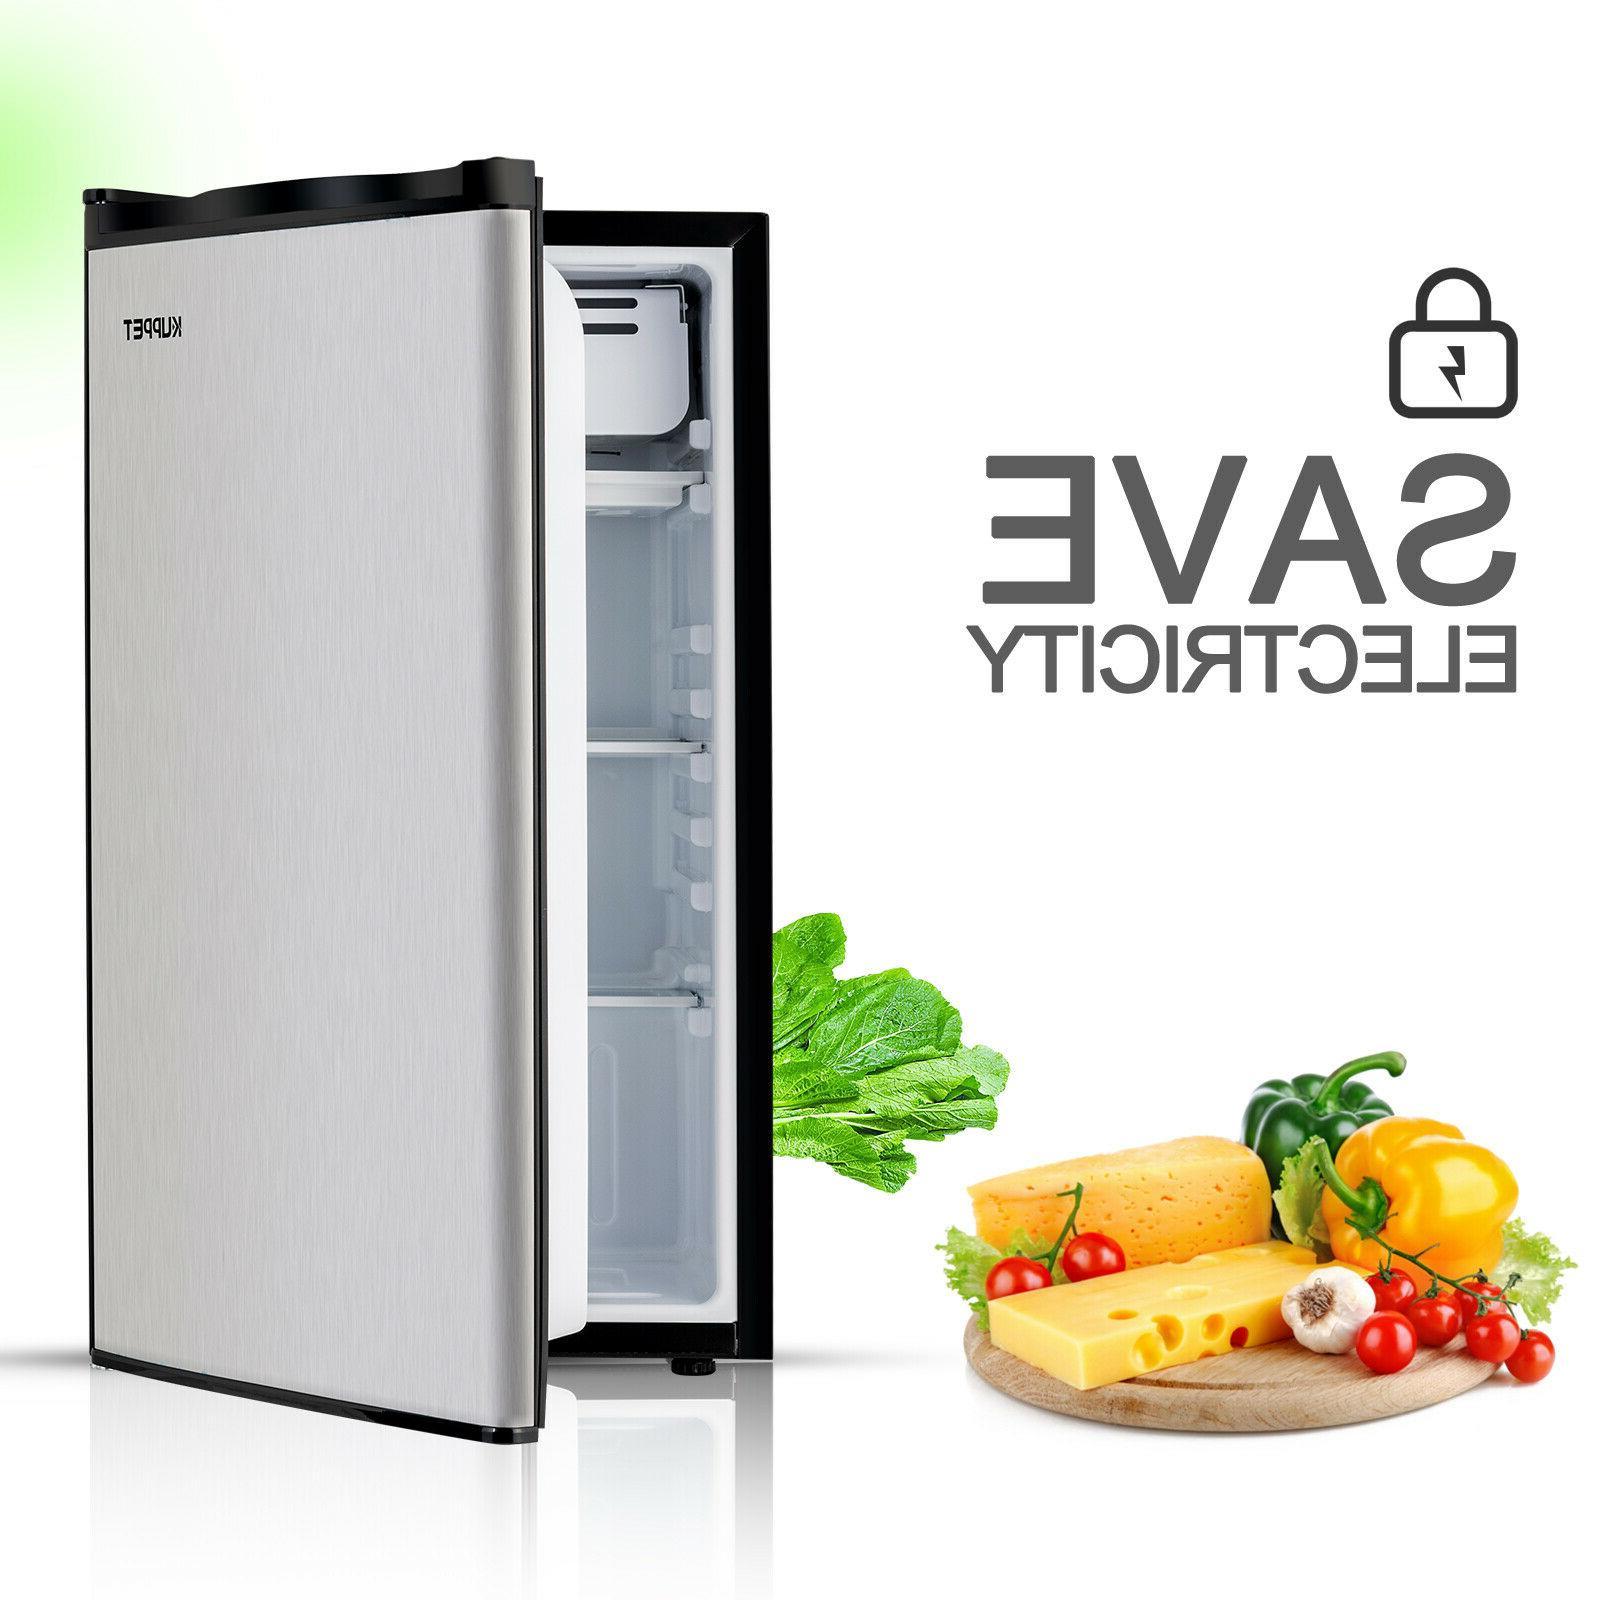 3.2 Mini Refrigerator Compact Black